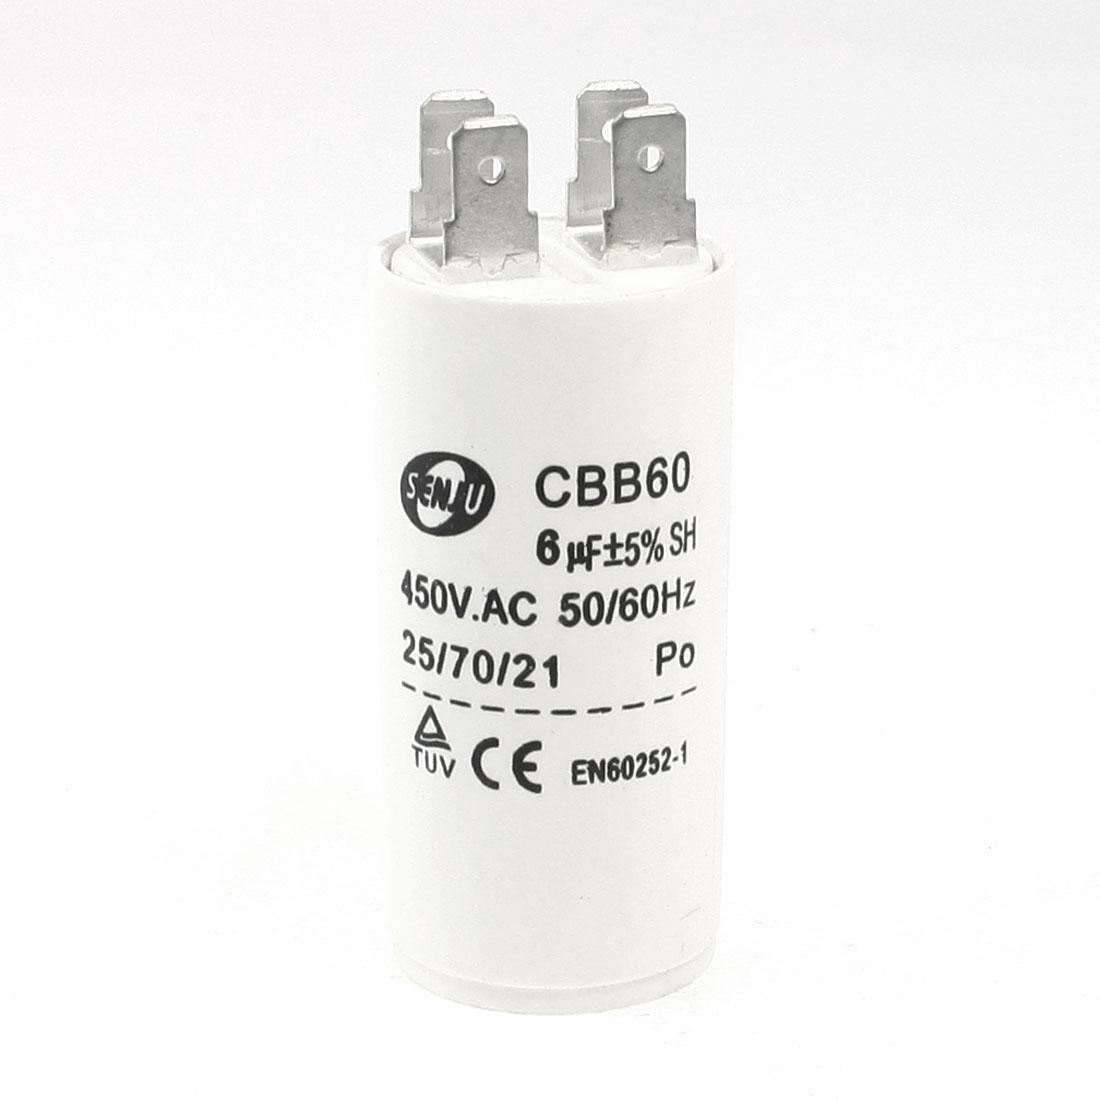 Household Washers Non Polar Motor Capacitor White 6UF 450VAC CBB60